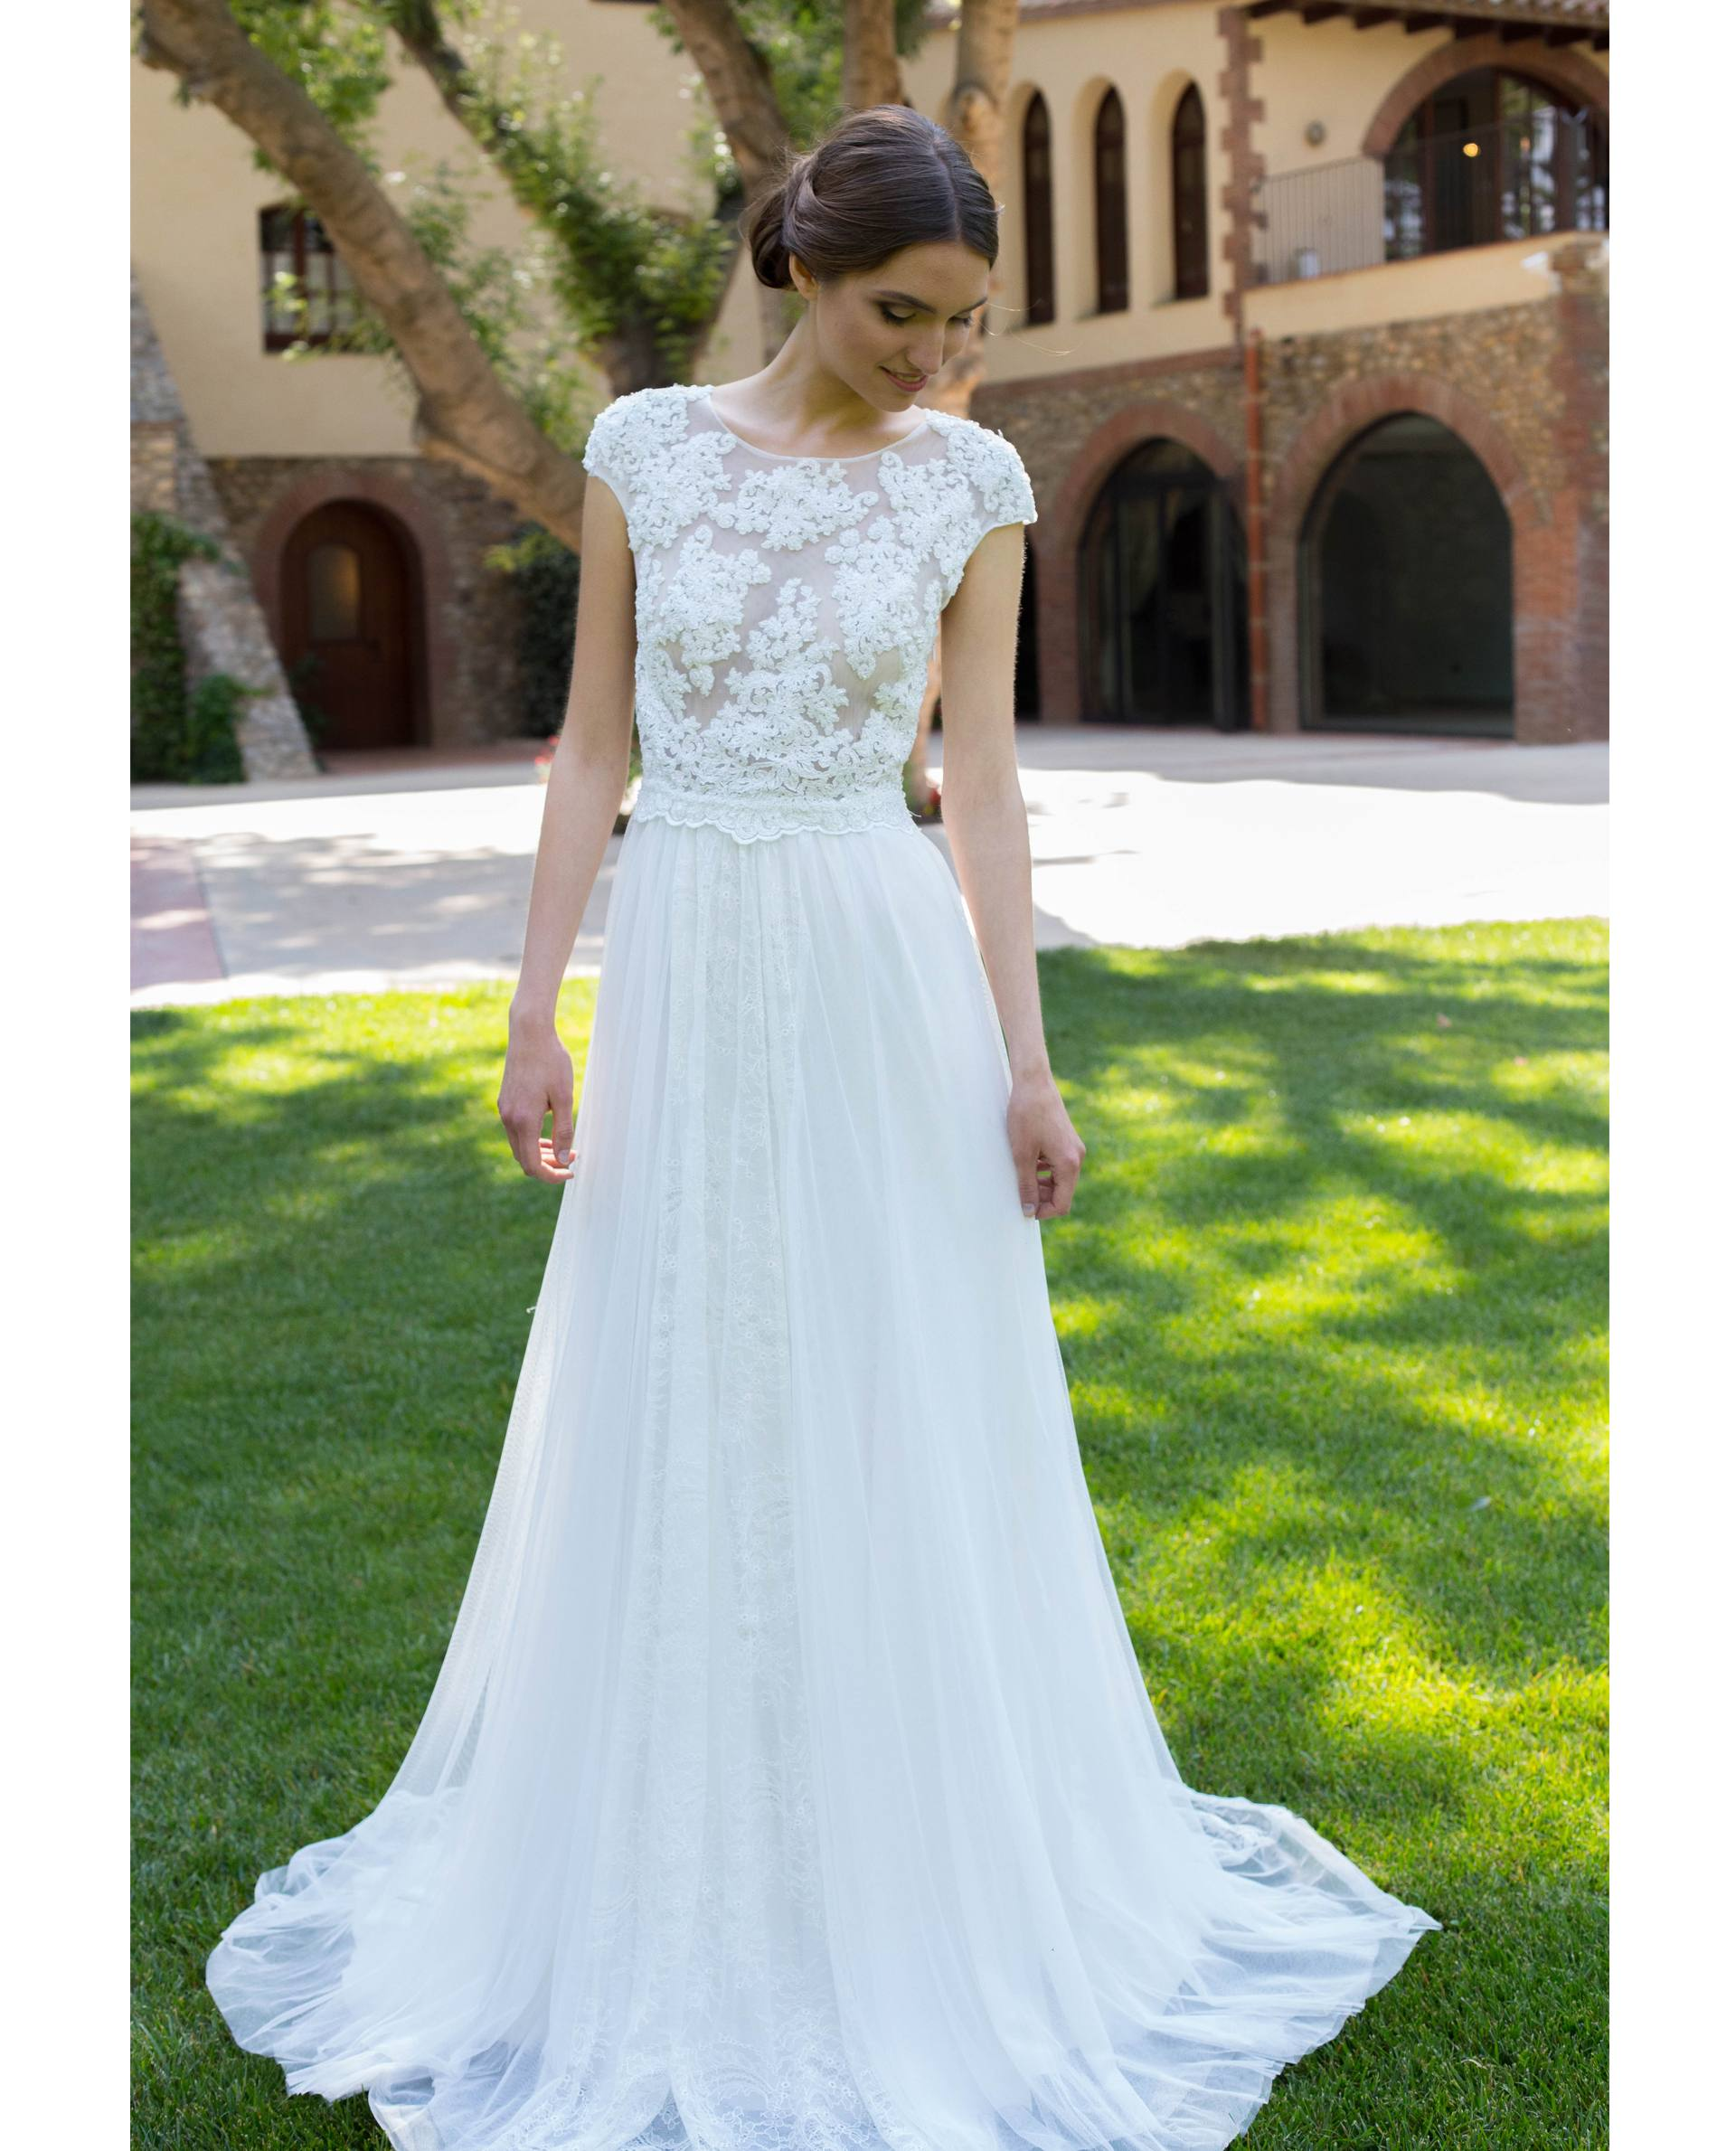 BRIDAL-NATURE 2018/19 - VESTIDOS - vestido novia Alba